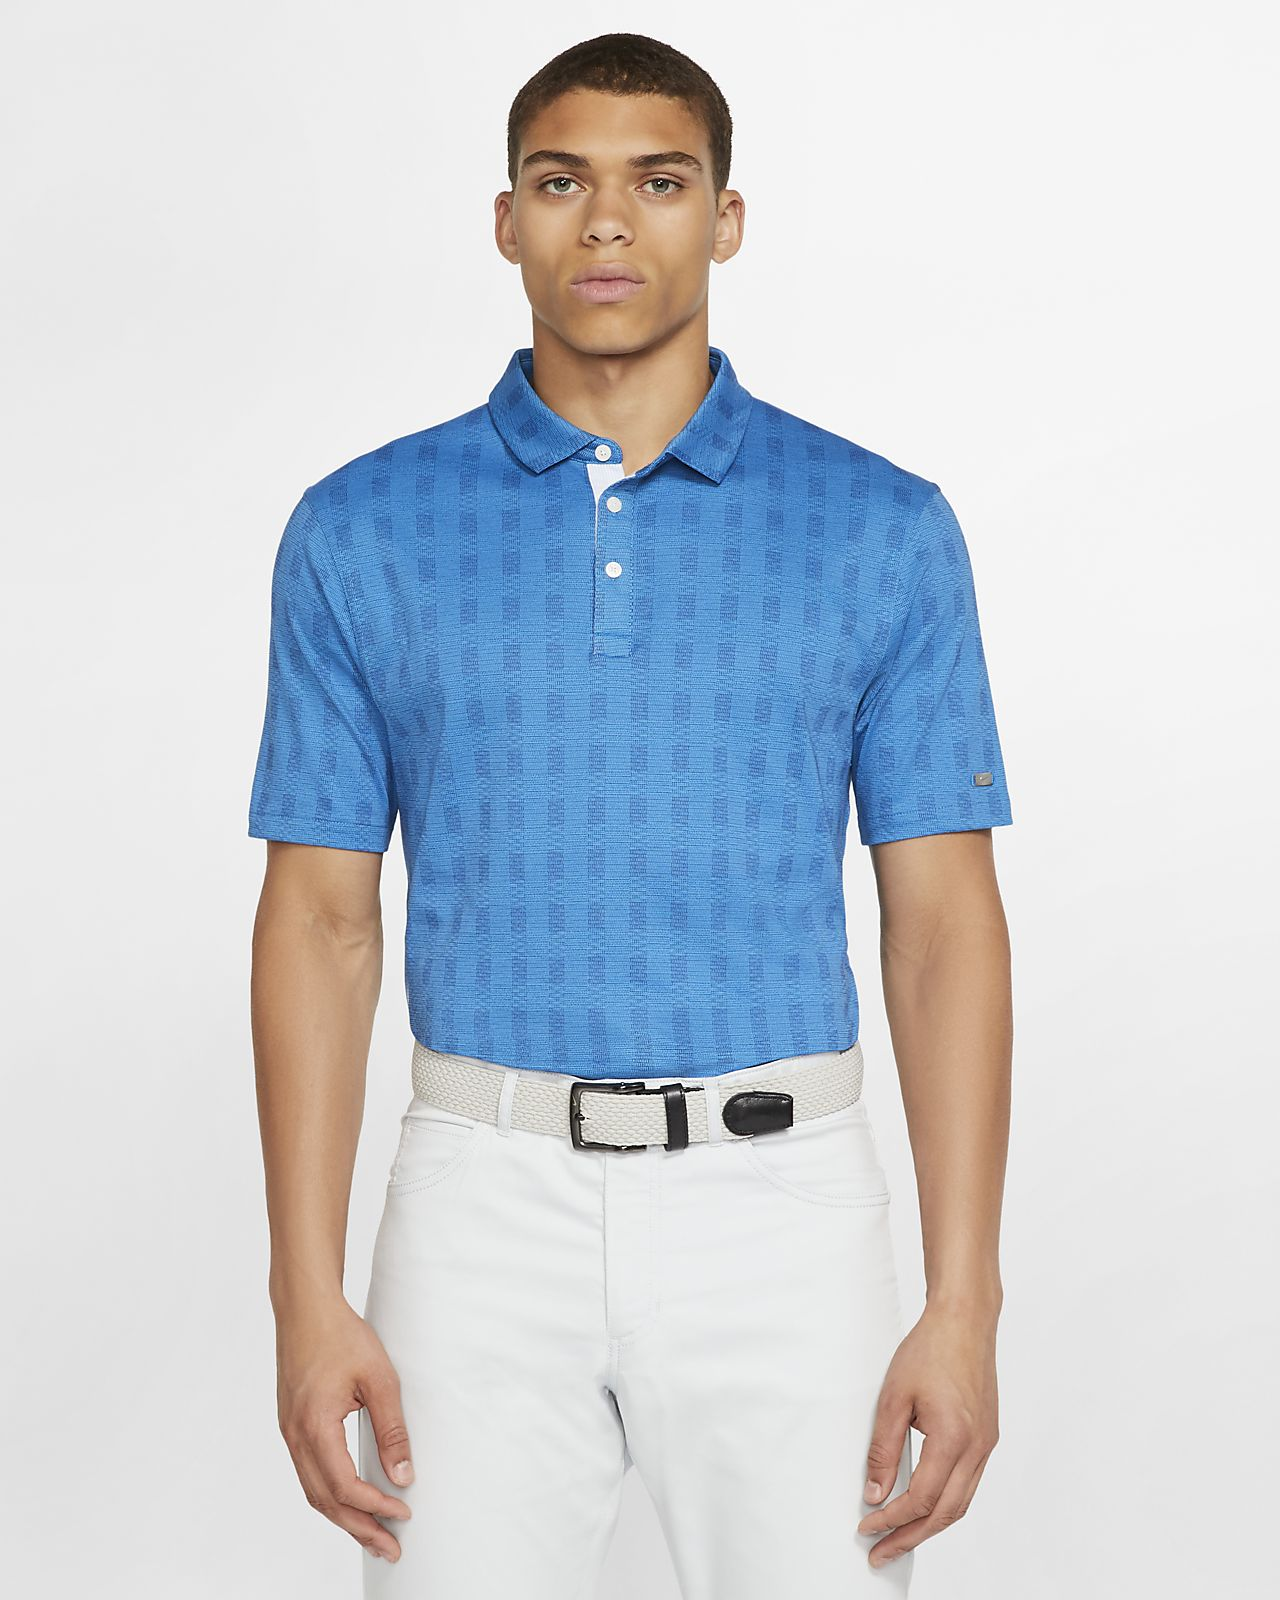 Nike Dri-FIT Player Men's Plaid Golf Polo